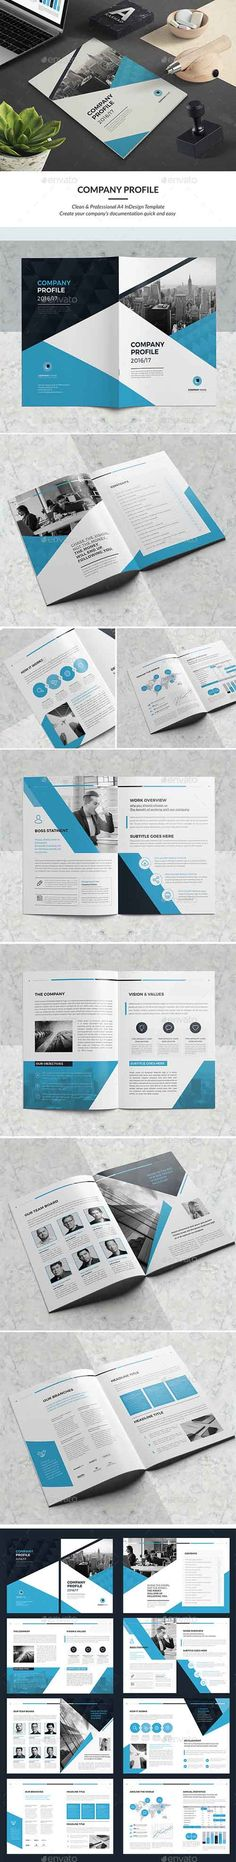 Company Profile Brochure Template Brochure Template Company